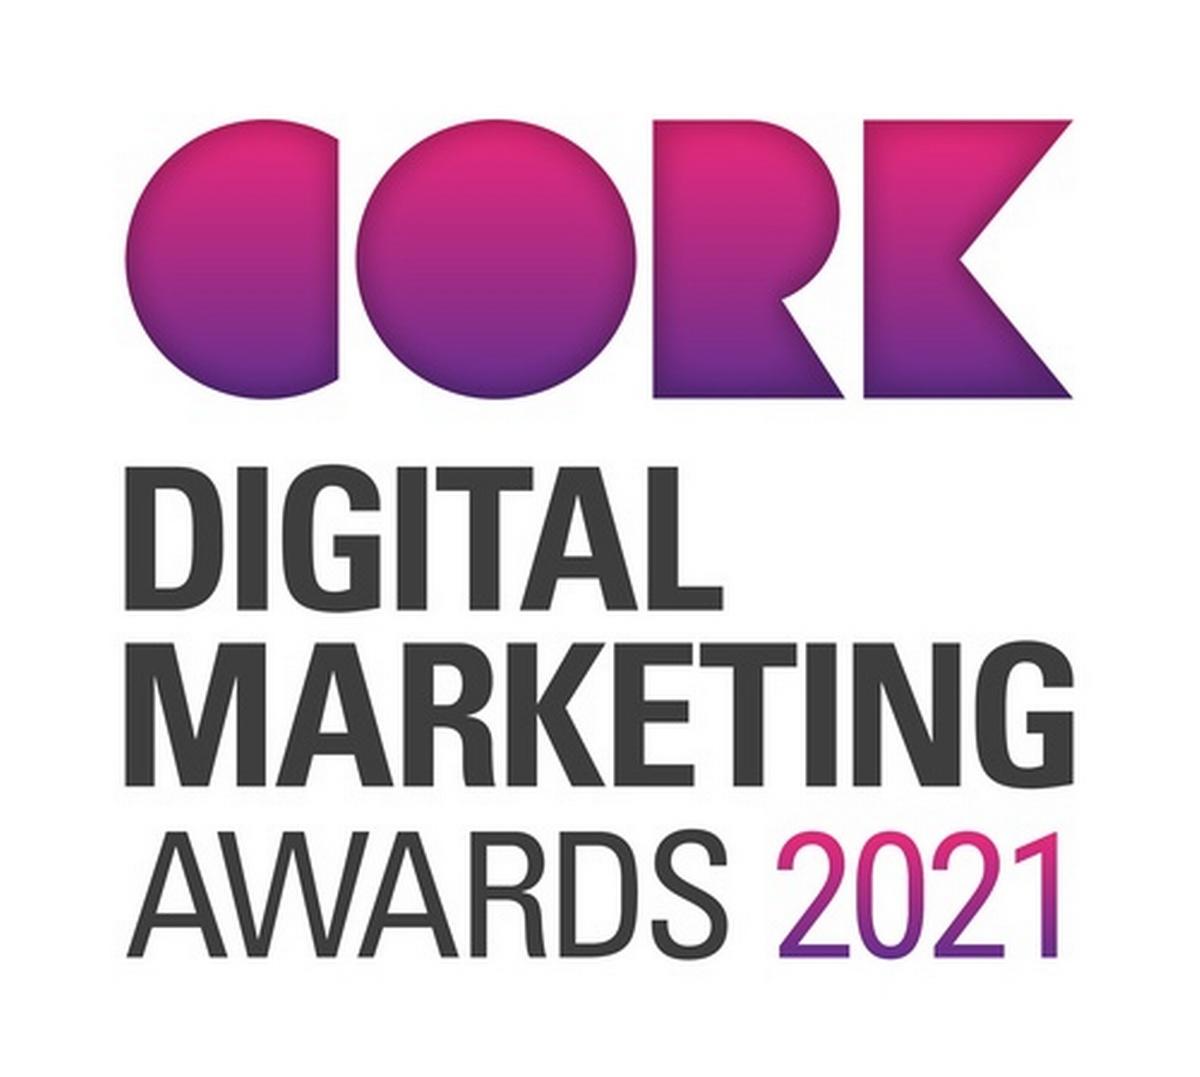 Cork Digital Marketing Awards Ceremony